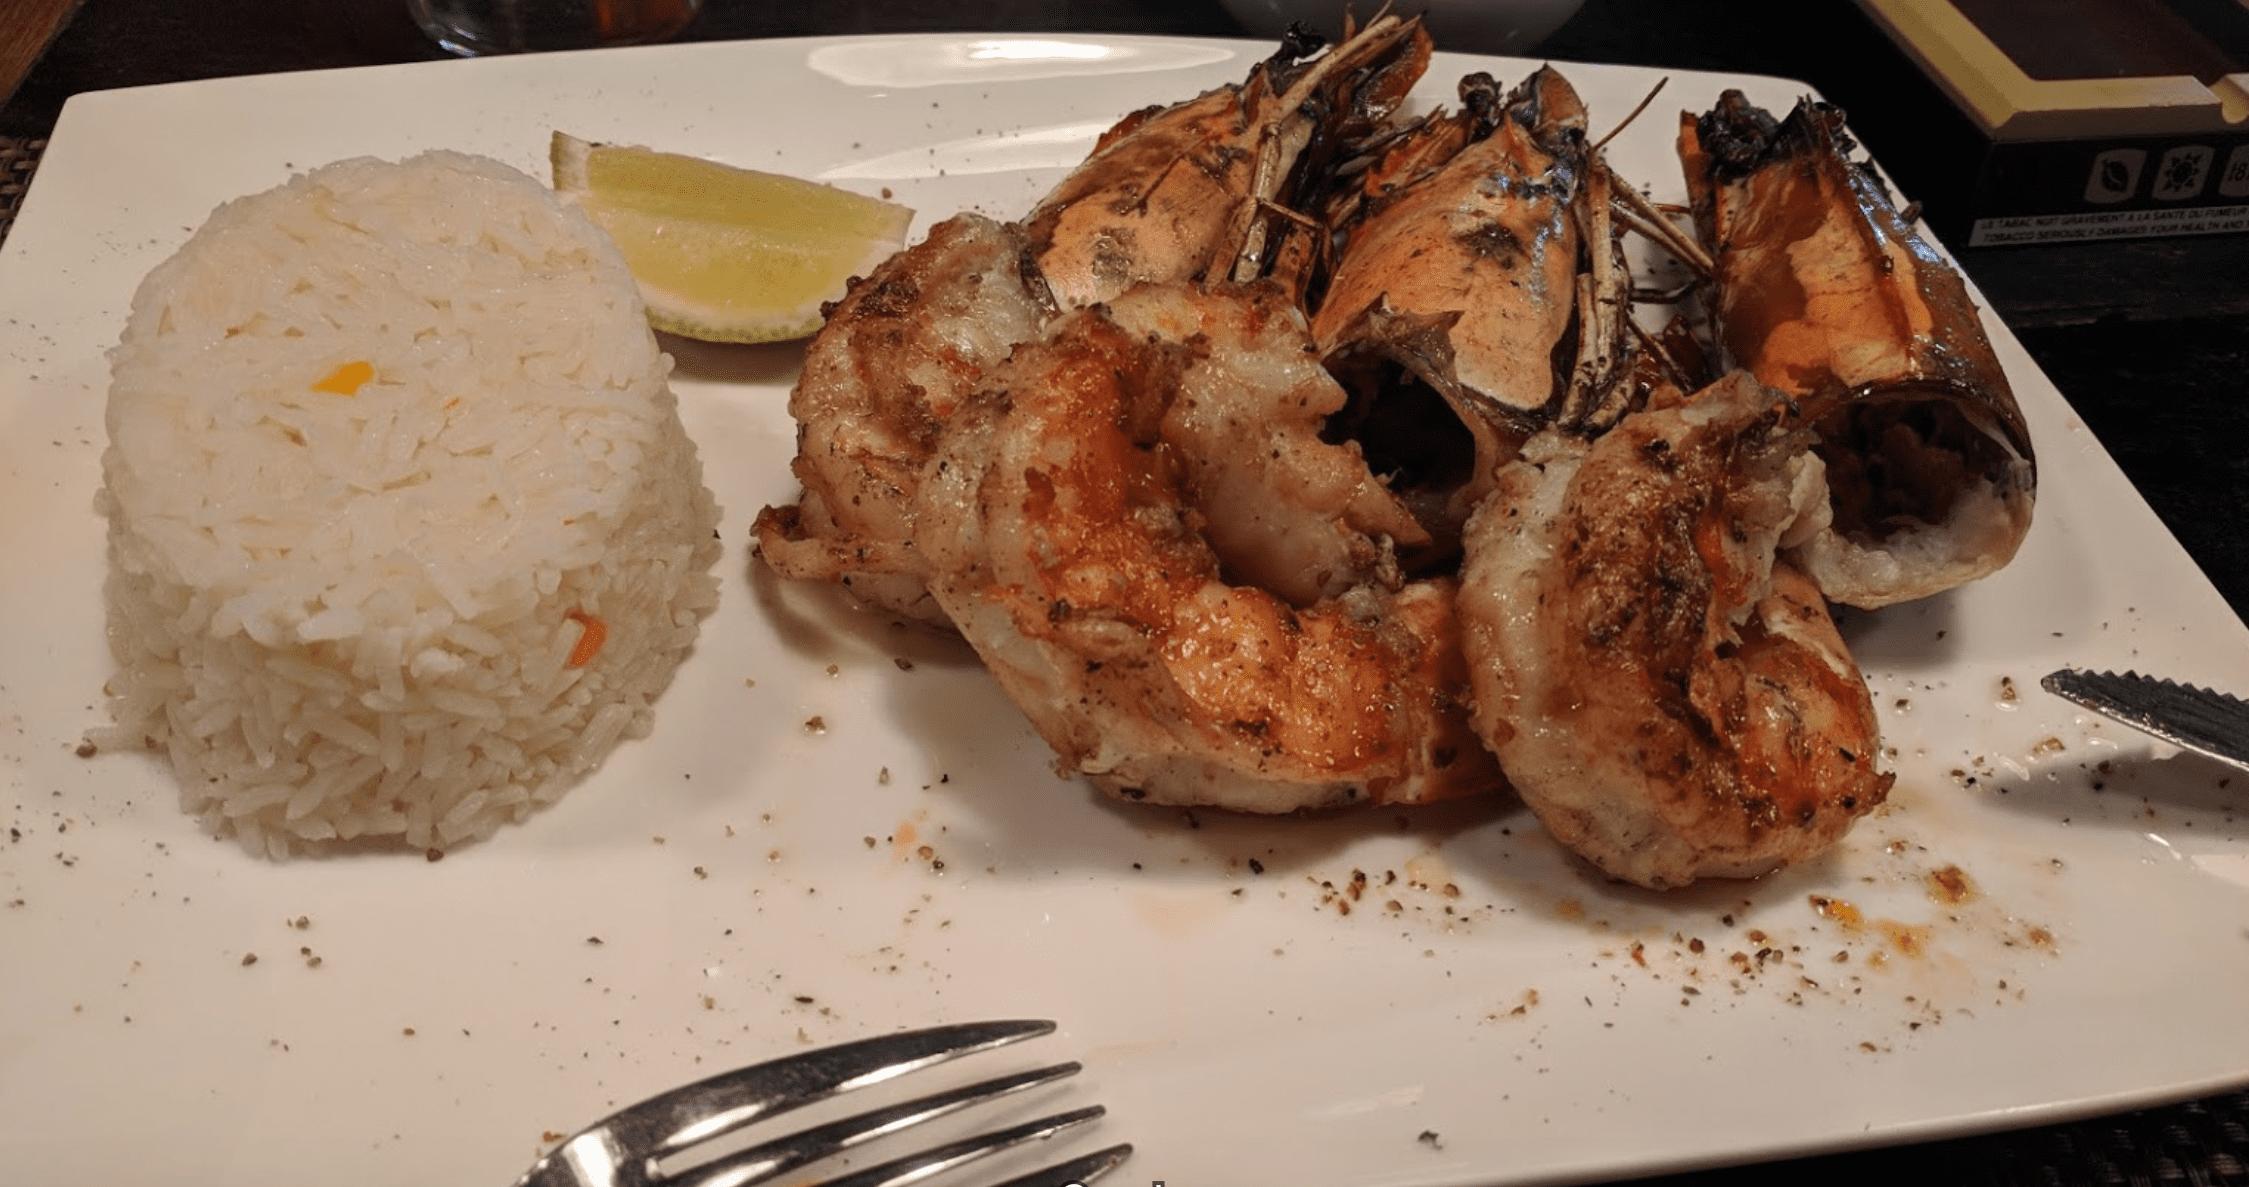 Le Boj top restaurants in douala cameroon